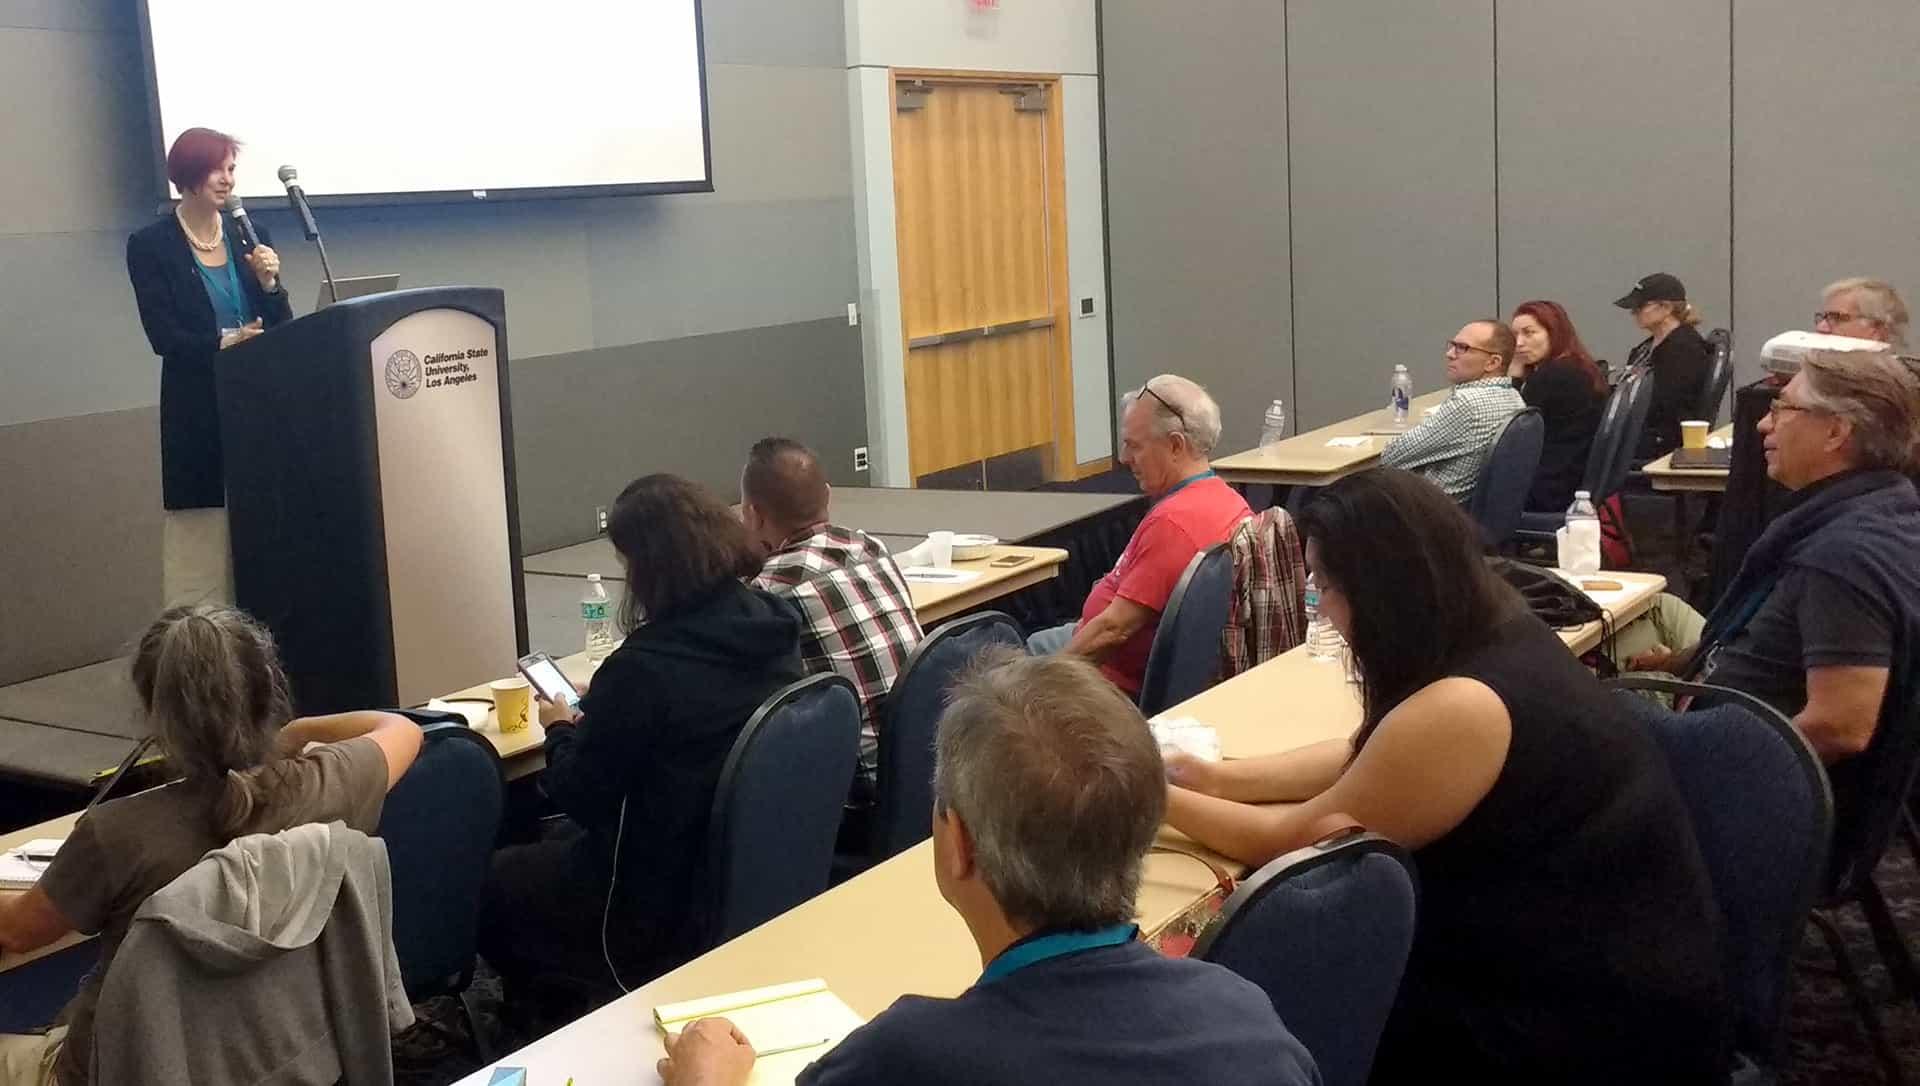 Speaking at WordCamp LAX 2016